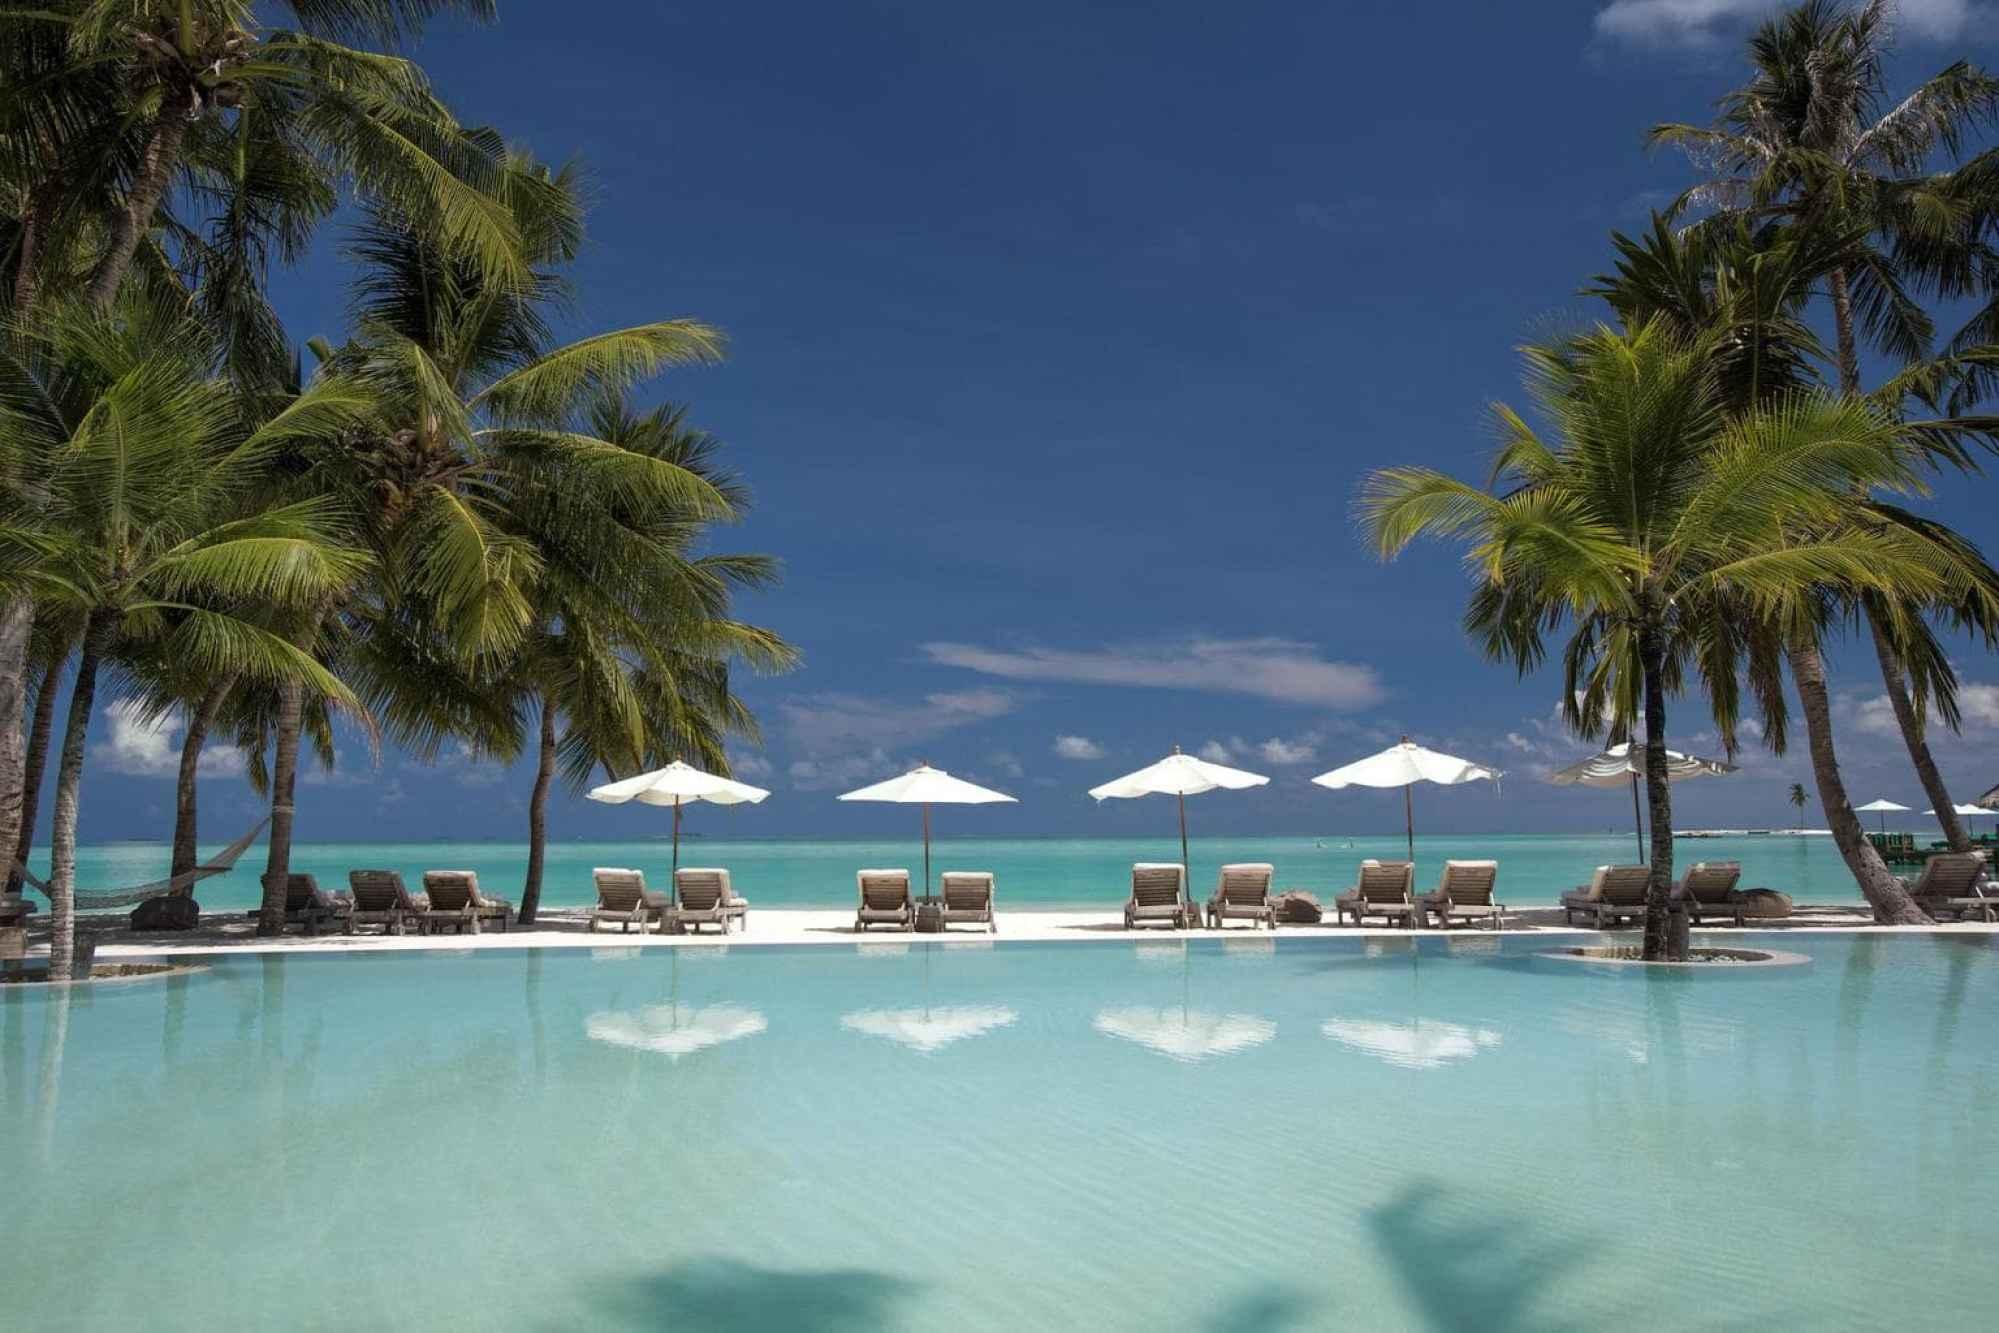 Gili Lankanfushi swimming pool - Courtesy of Gili Lankanfushi